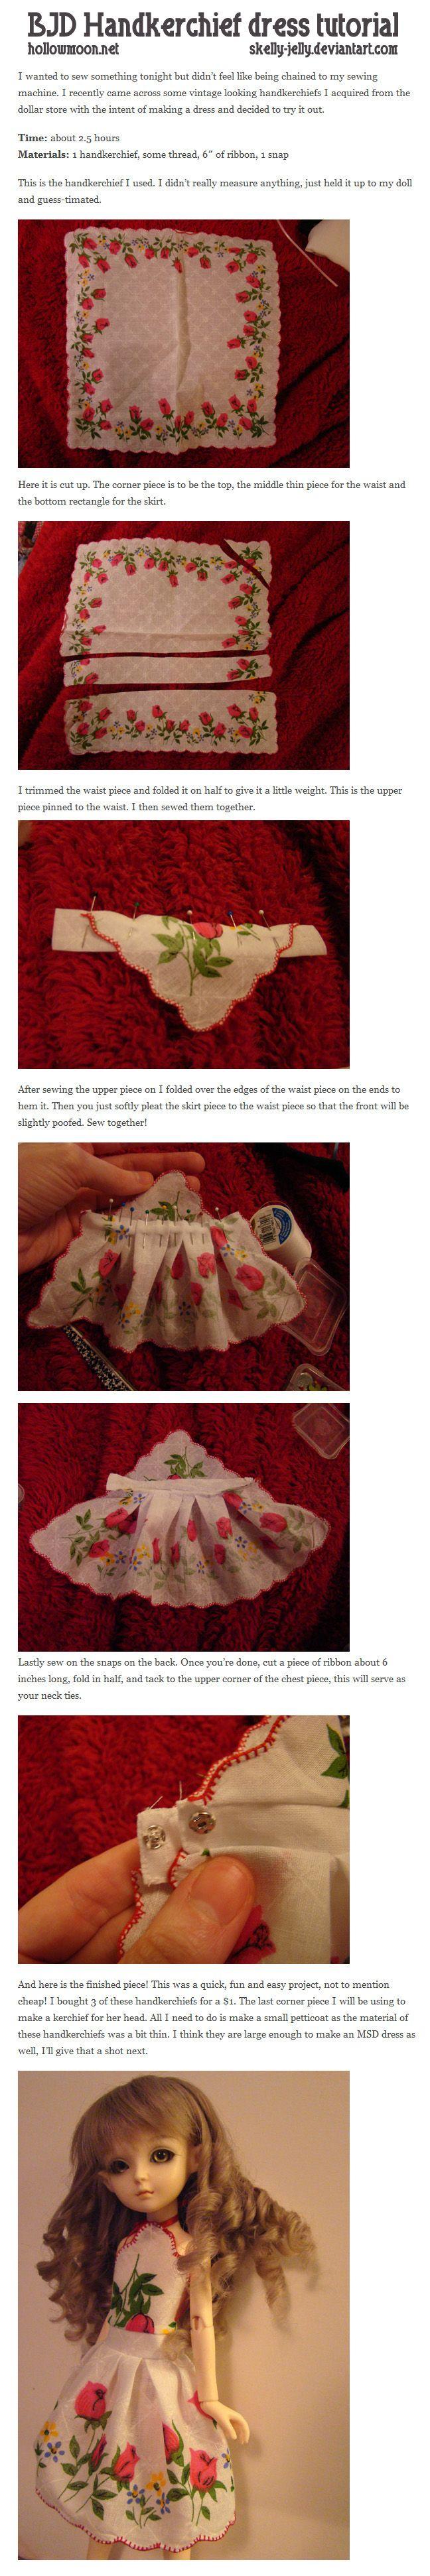 BJD Handkerchief dress tutorial by skelly-jelly on deviantART